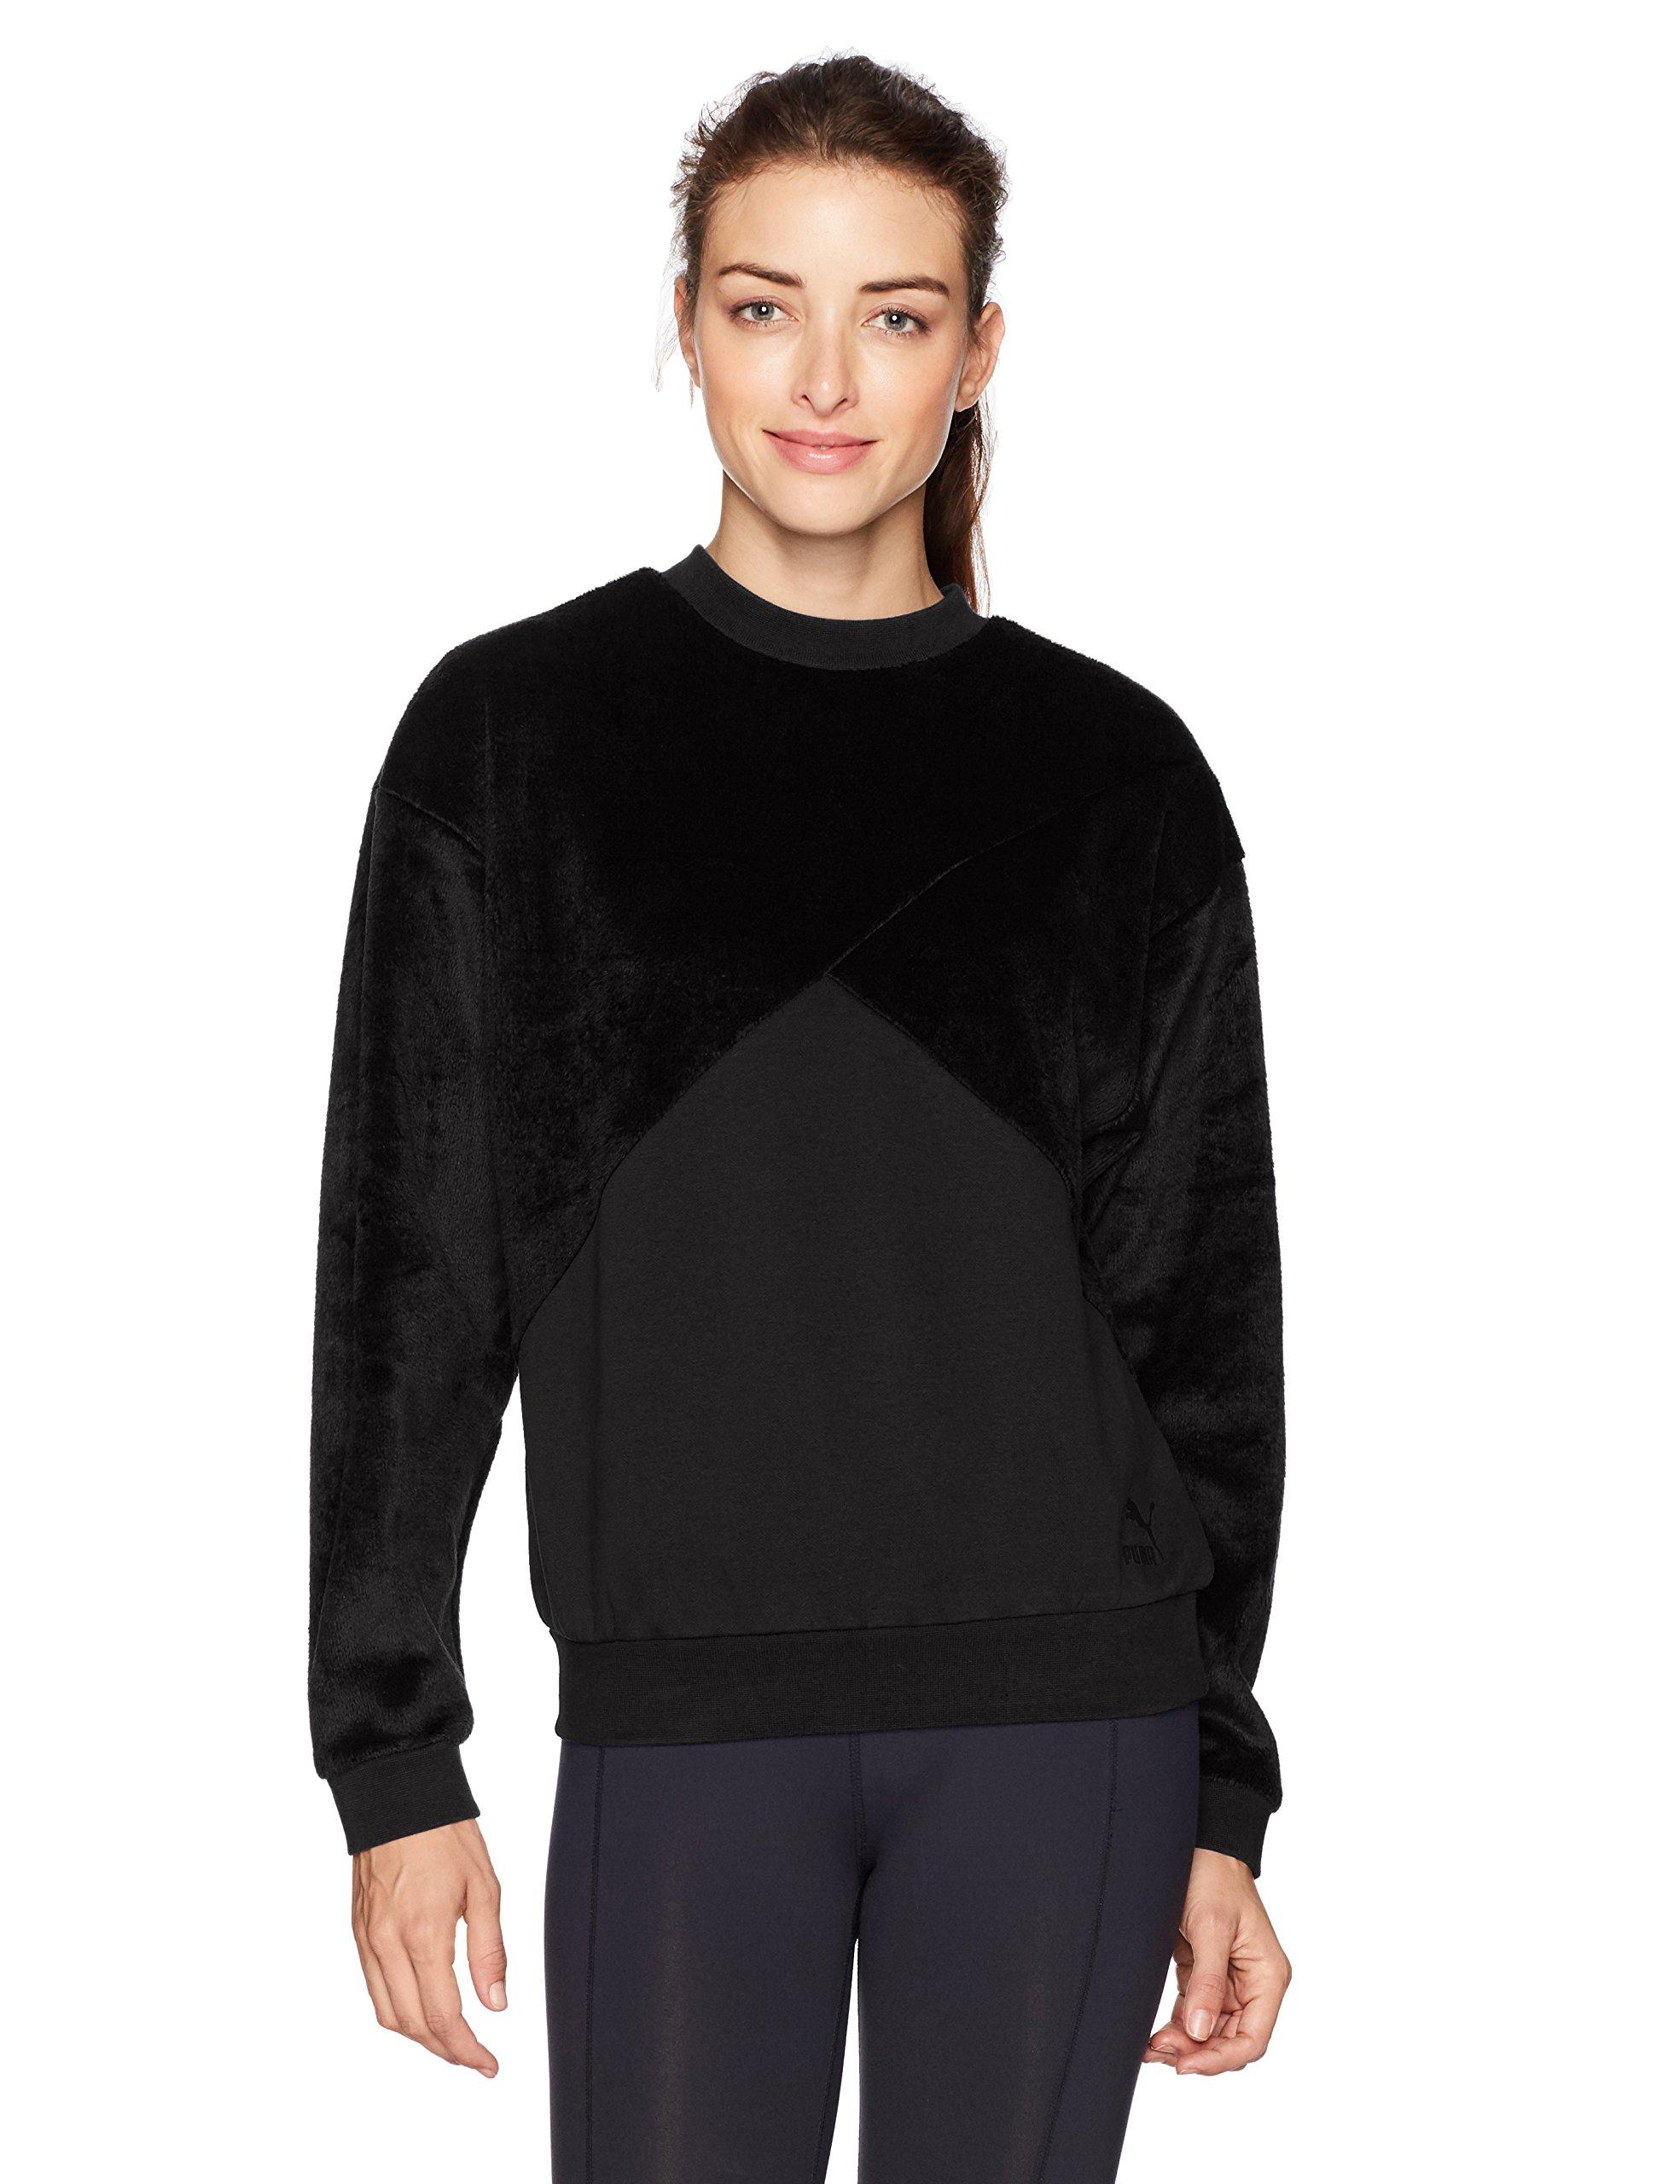 PUMA Women's Fabric Block Crew Neck Sweatshirt, Black, L